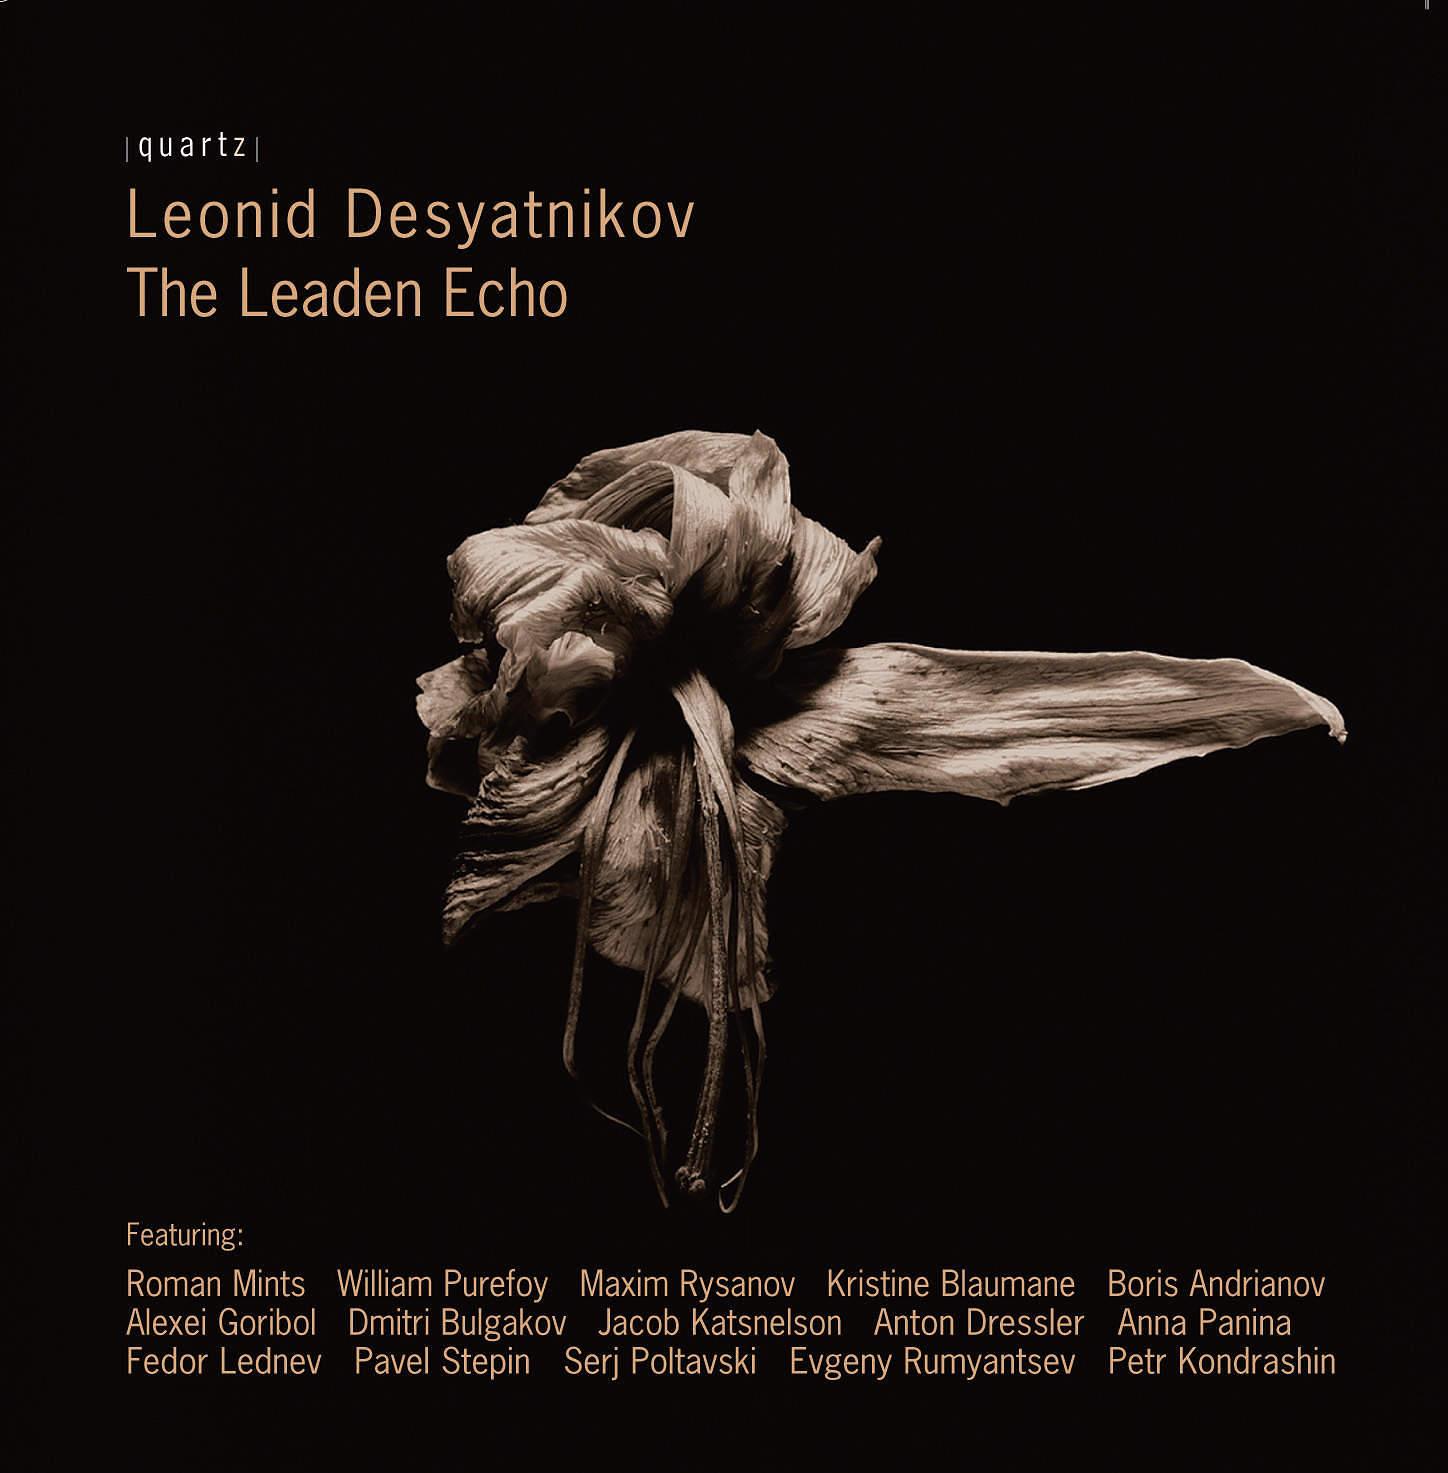 The Leaden Echo